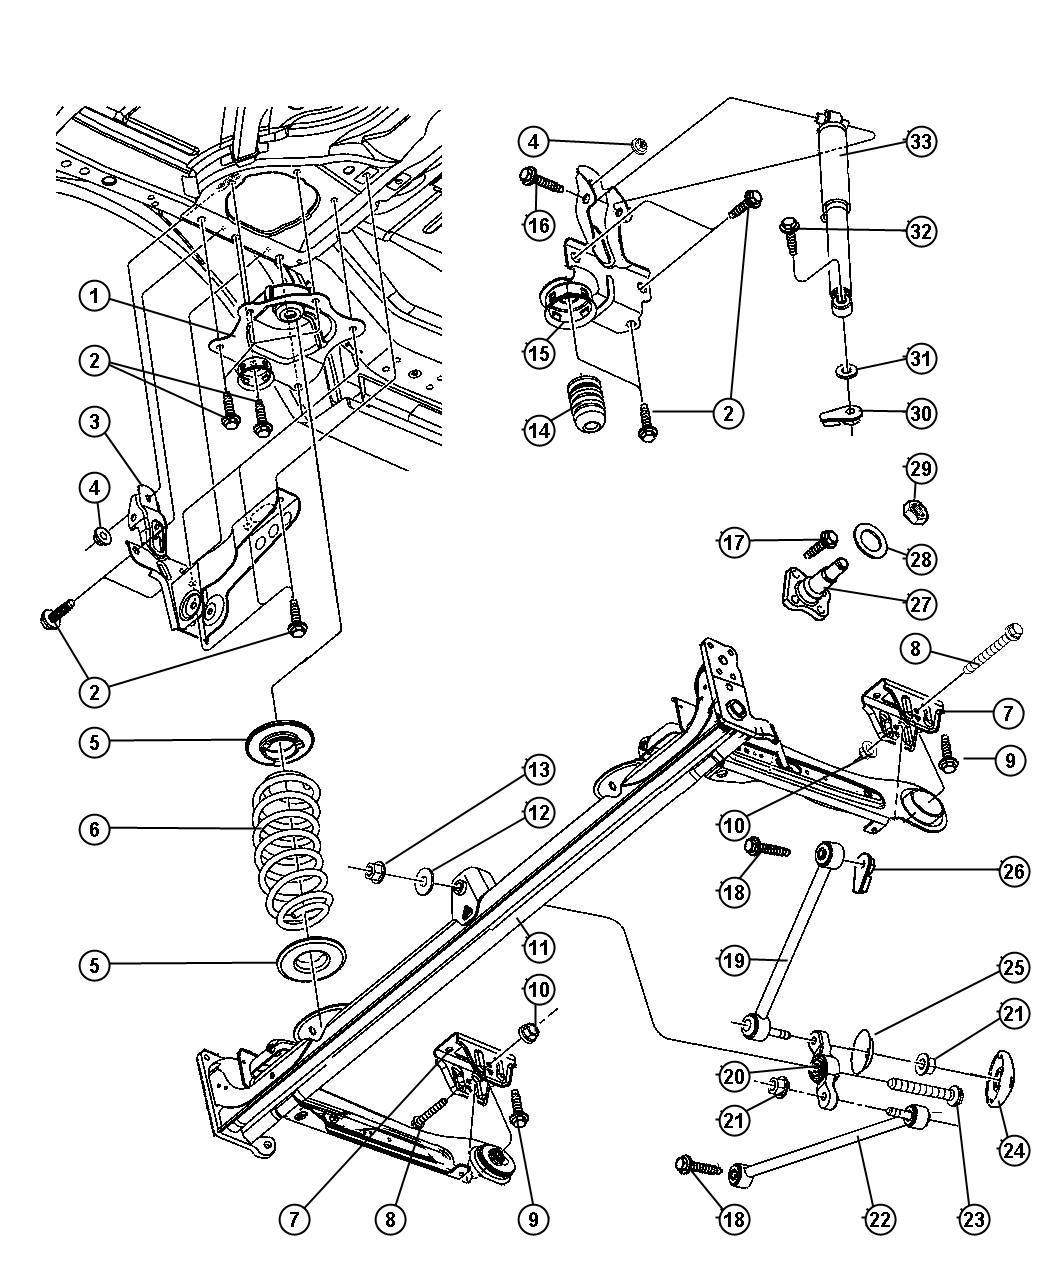 Egr Valve Location 2003 Tundra. Diagram. Auto Wiring Diagram